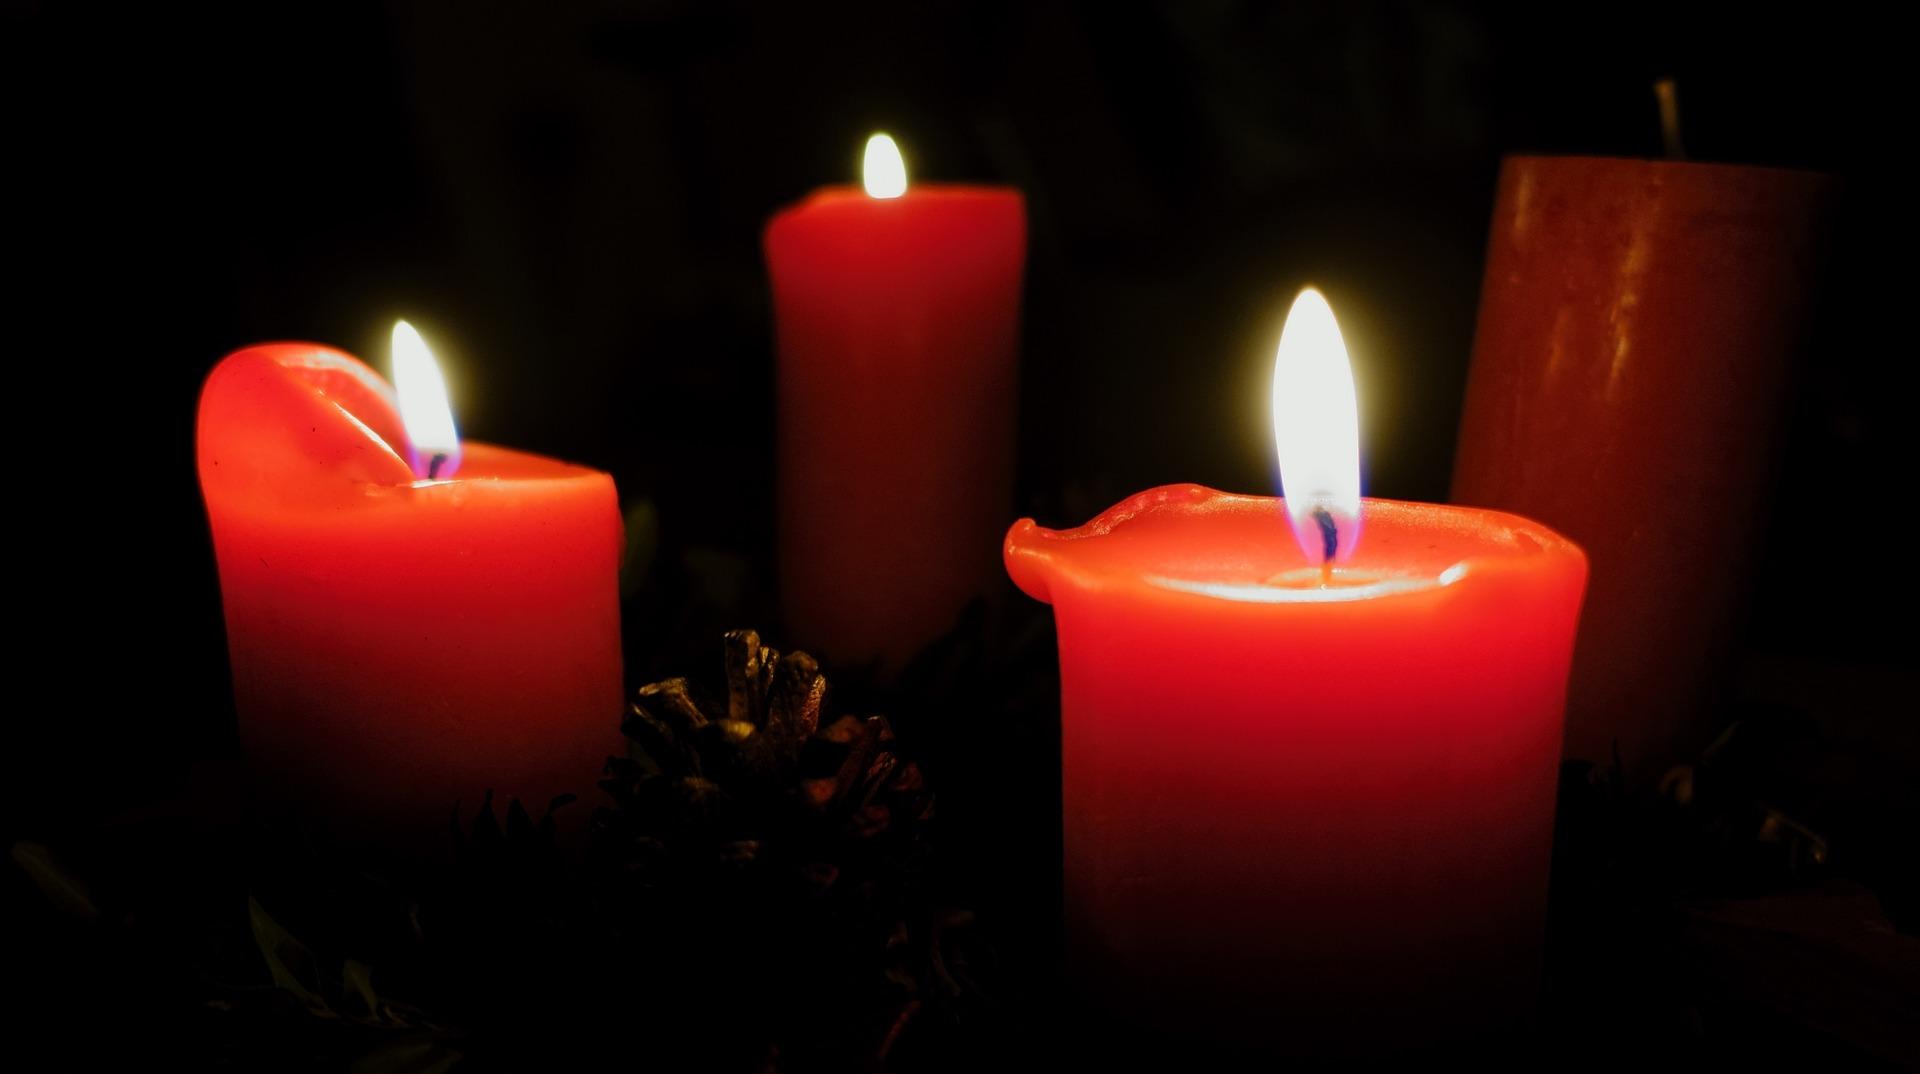 advent-wreath-573572_1920.jpg